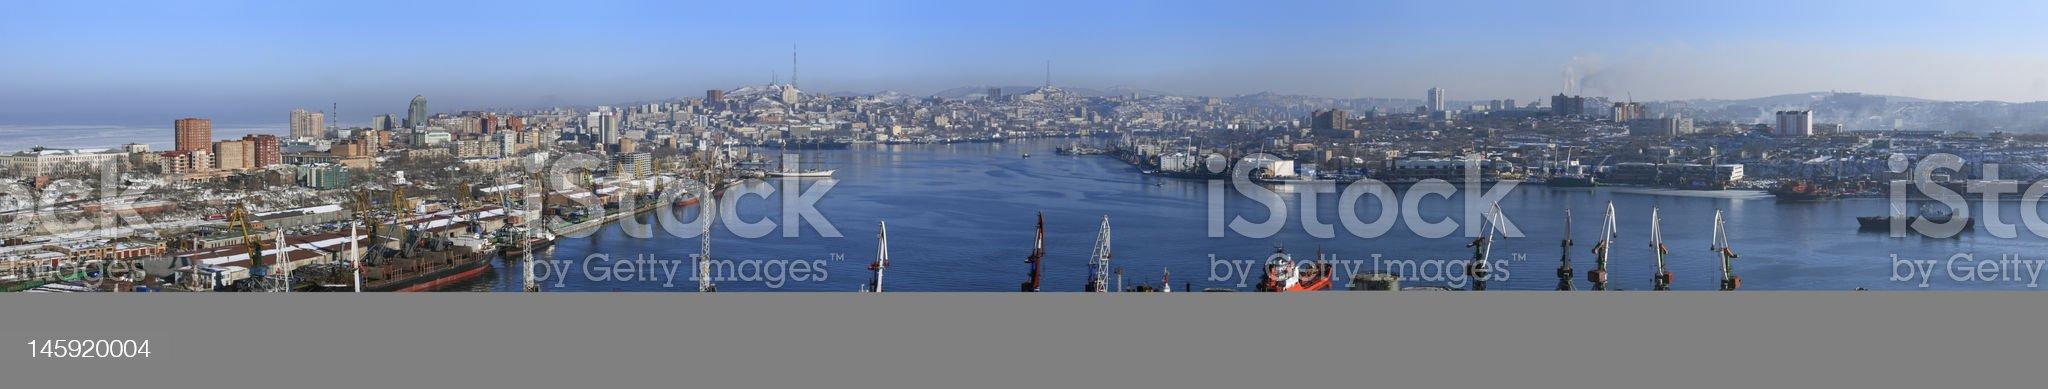 Vladivostok, panarama of Golden Horn Bay royalty-free stock photo